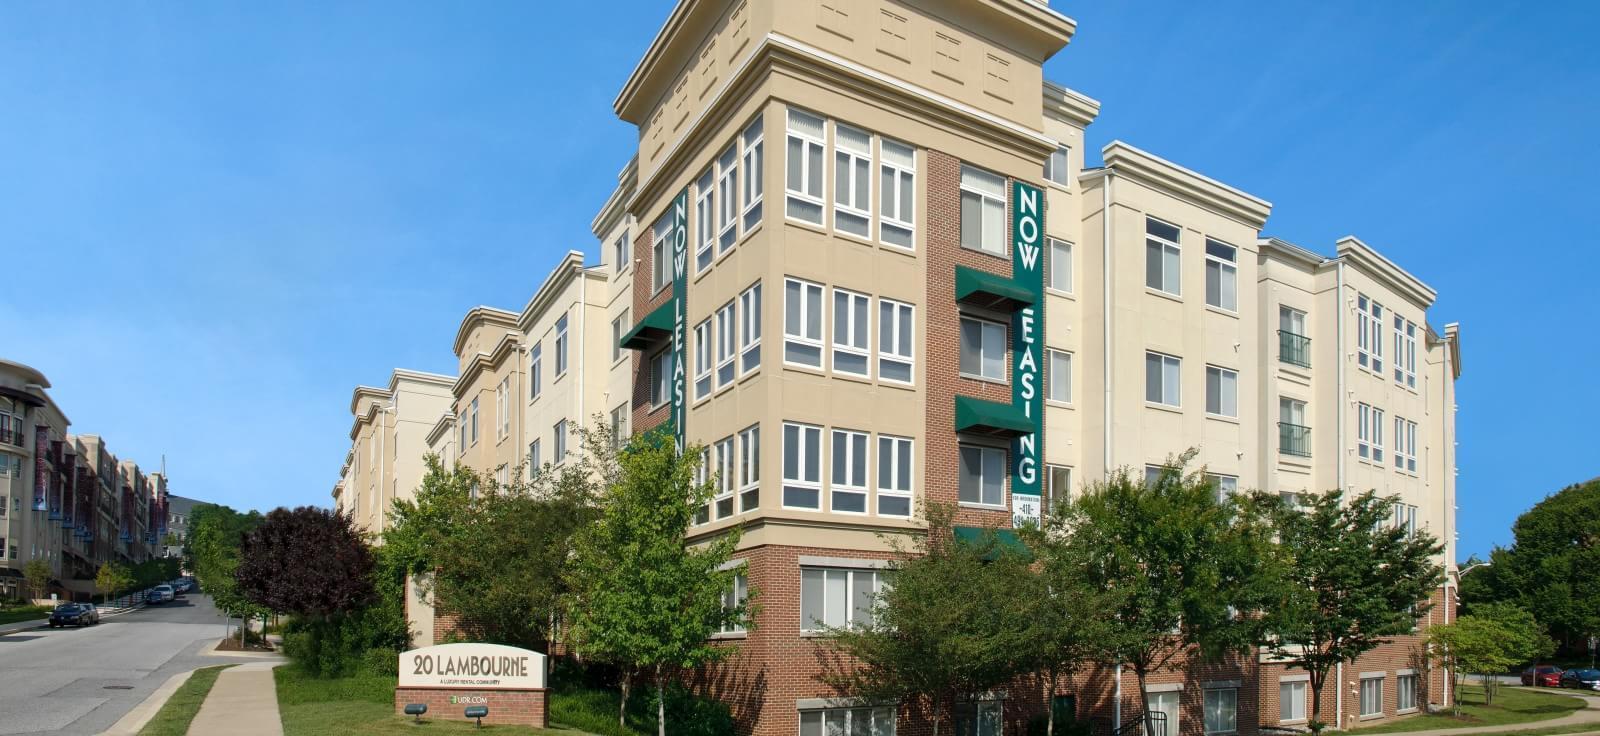 20 Lambourne Apartments photo #1